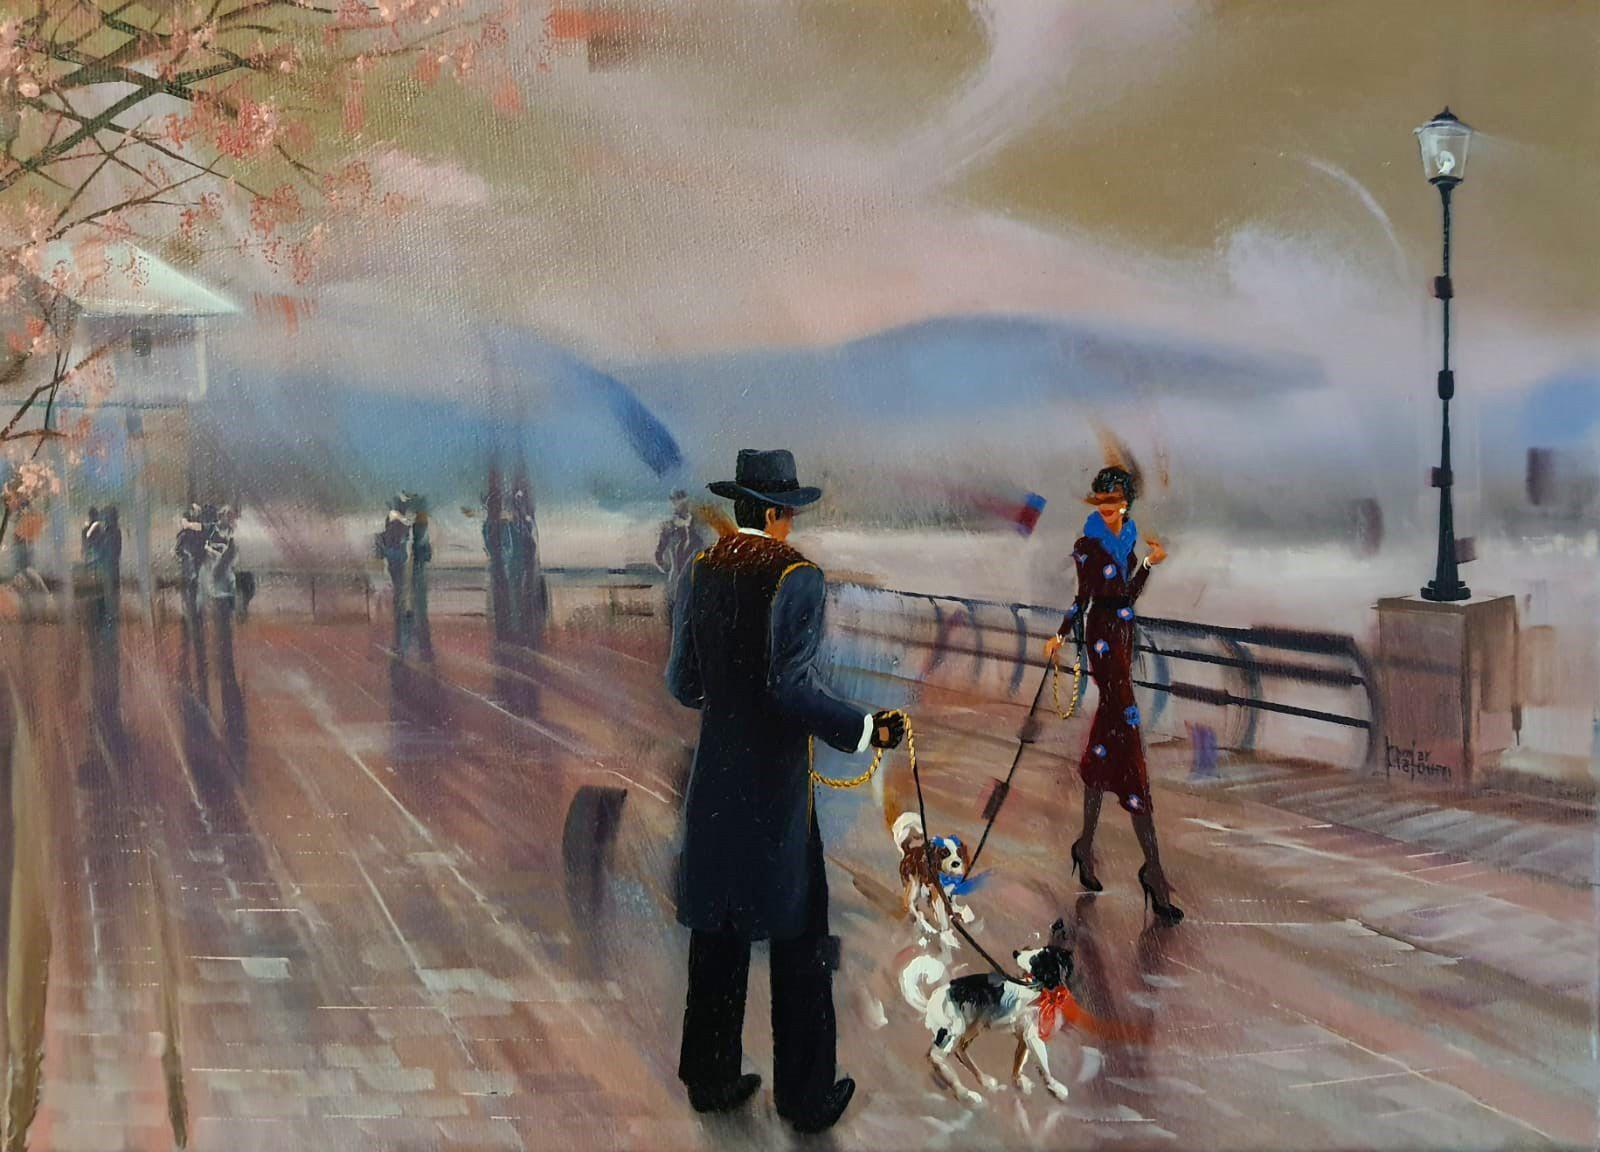 Kamiar Gajoum Vancouver Paths Original Oil Painting 12x16